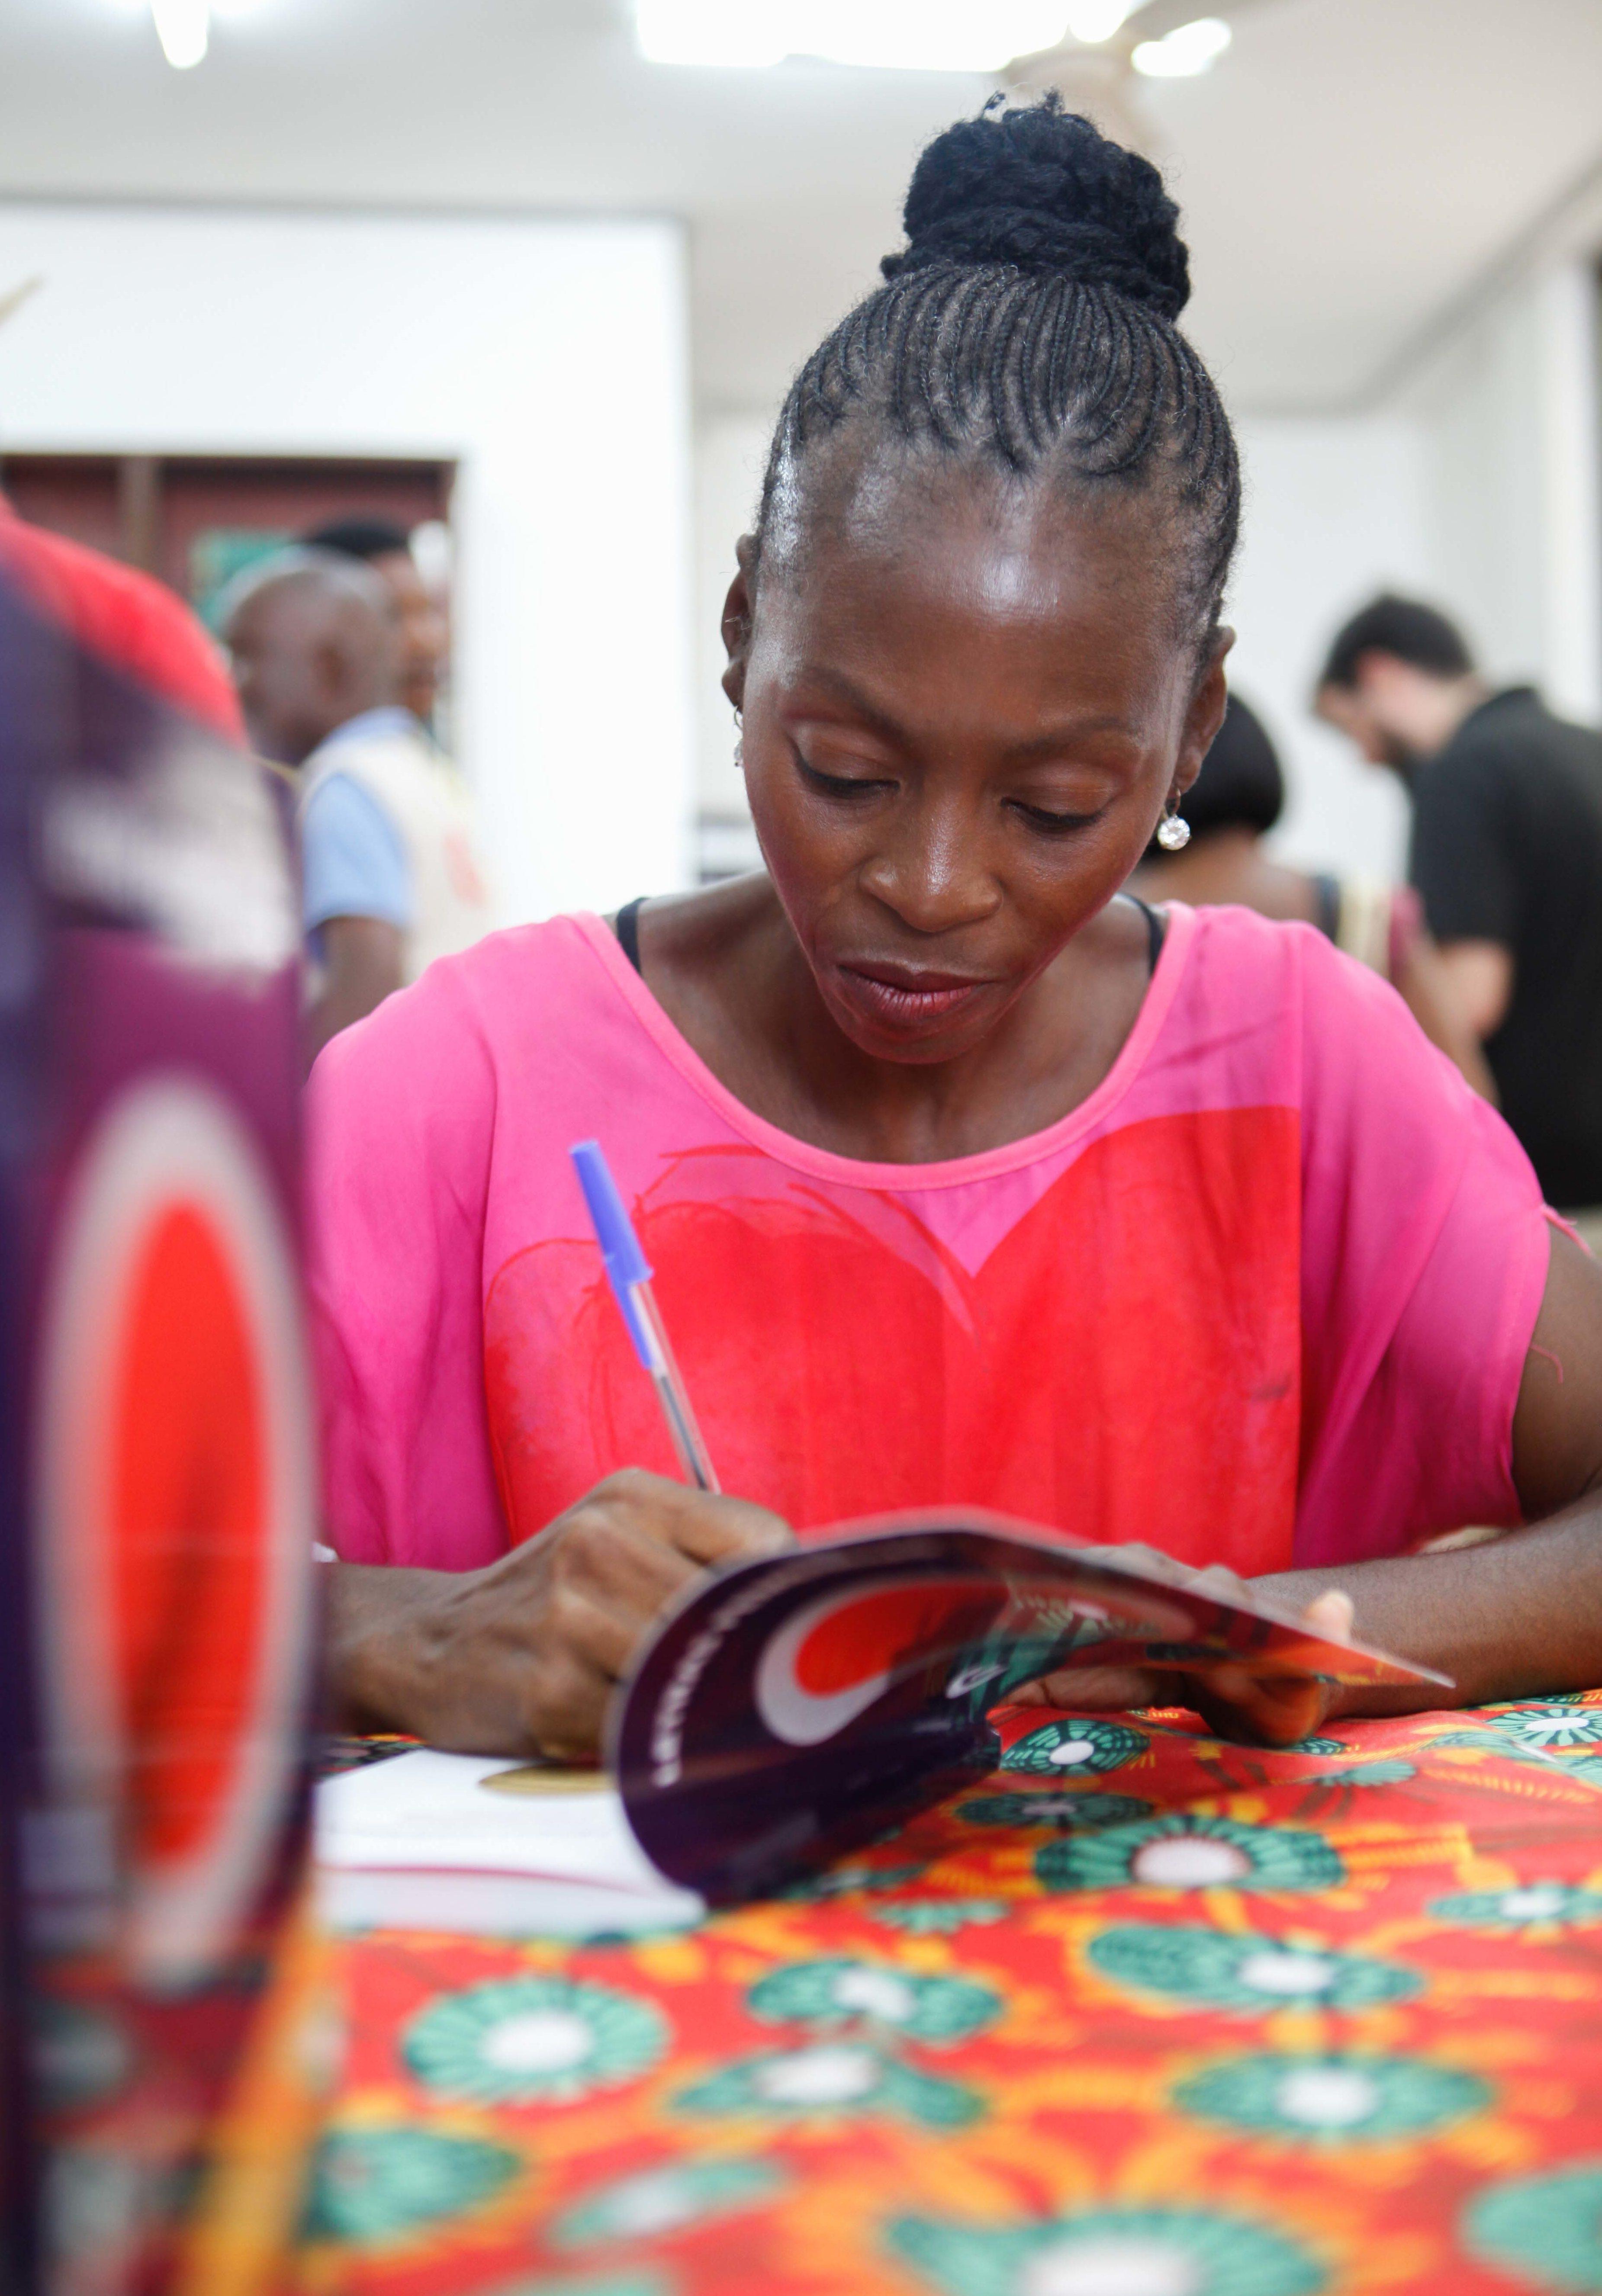 La escritora Carmen Mangue firmando libros